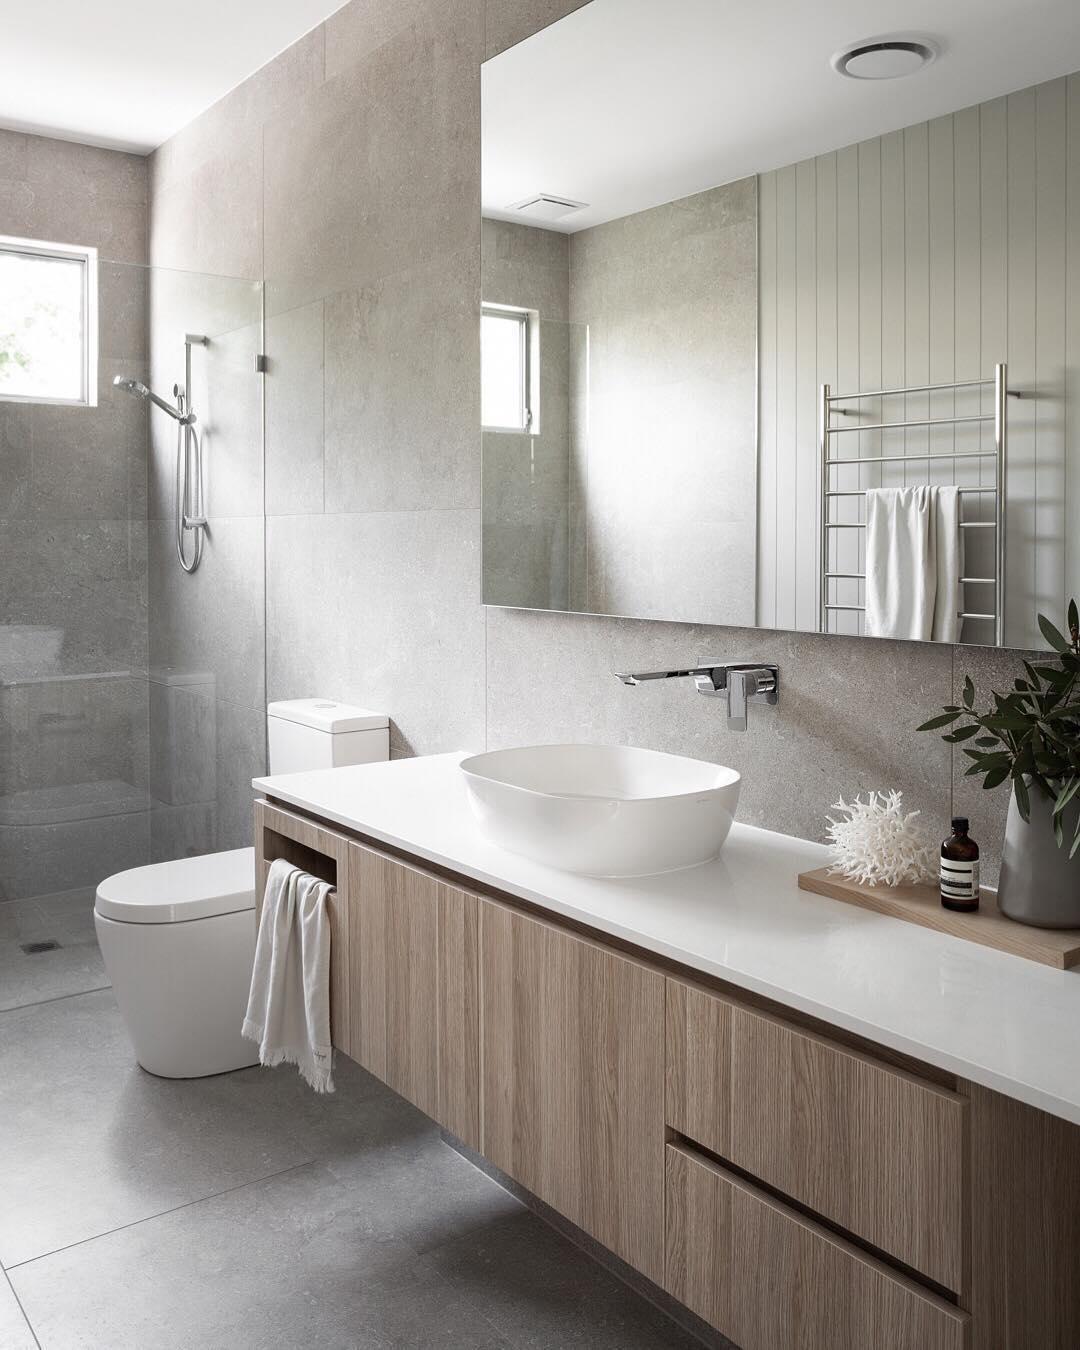 36 Tips For Choosing The Right Bathroom Tile Designs Trends Ideas Bathroom Bathroomi In 2020 Bad Fliesen Designs Modernes Badezimmerdesign Badezimmereinrichtung